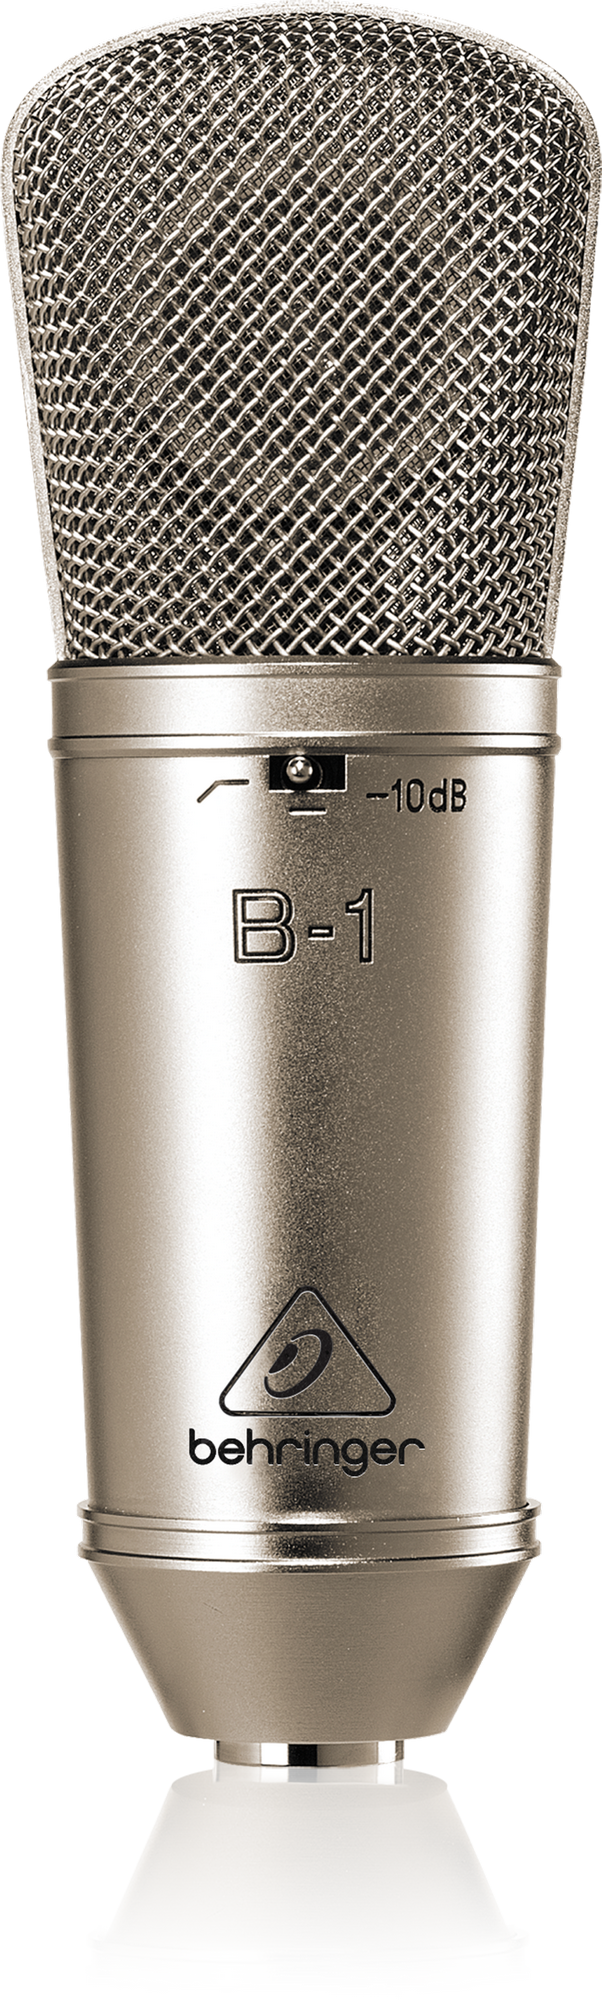 Behringer B-1  - Condenser Microphone